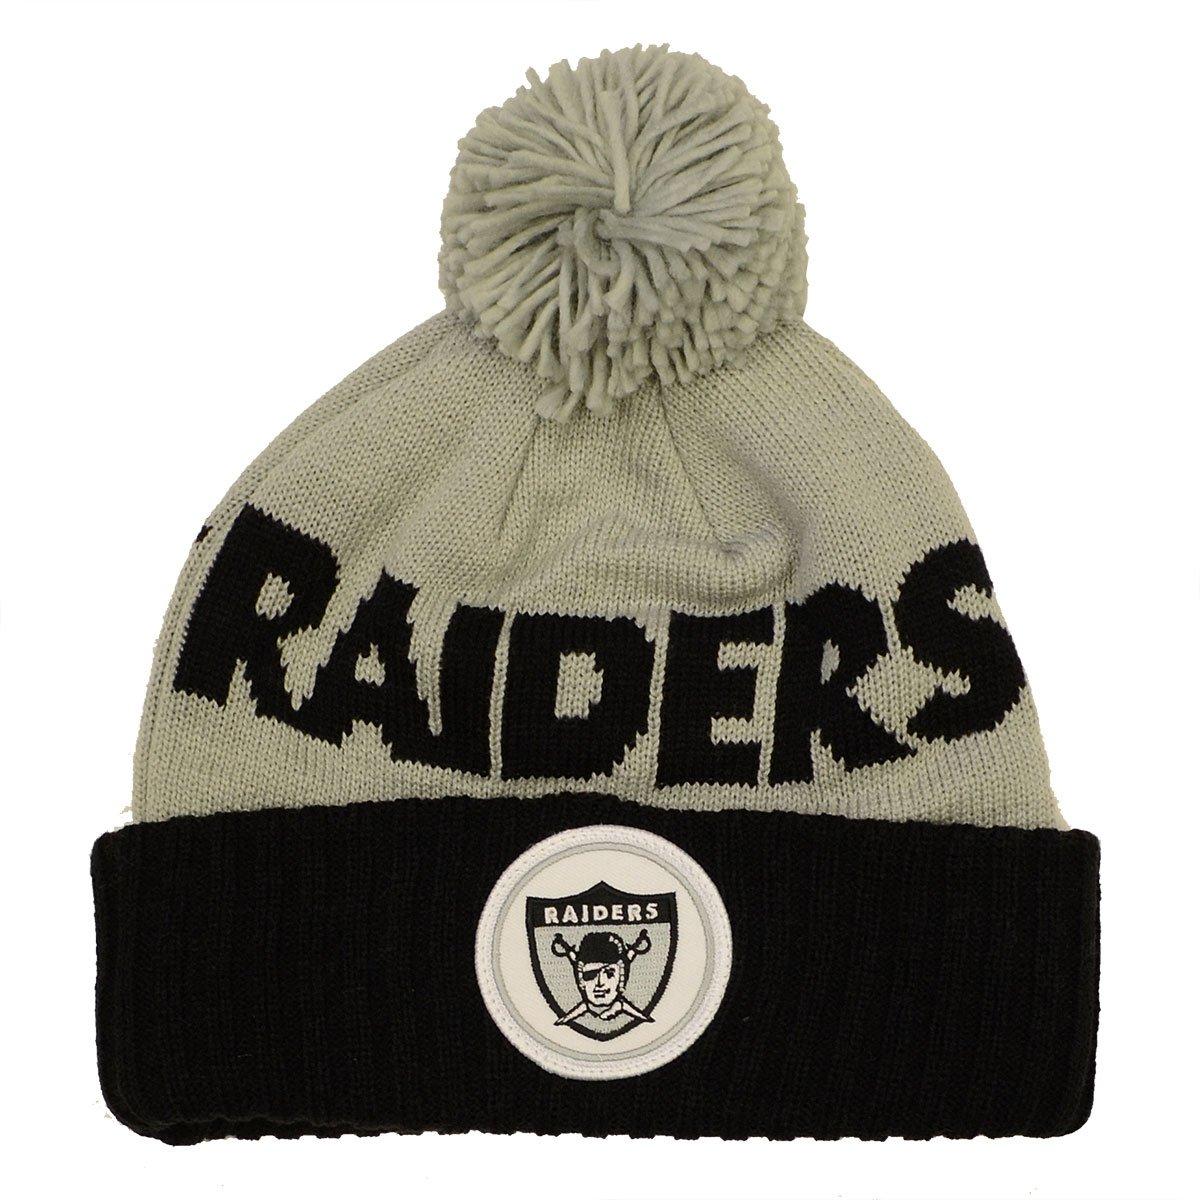 Mitchell & Ness NFL Throwback Cuffed Pom Knit Hat